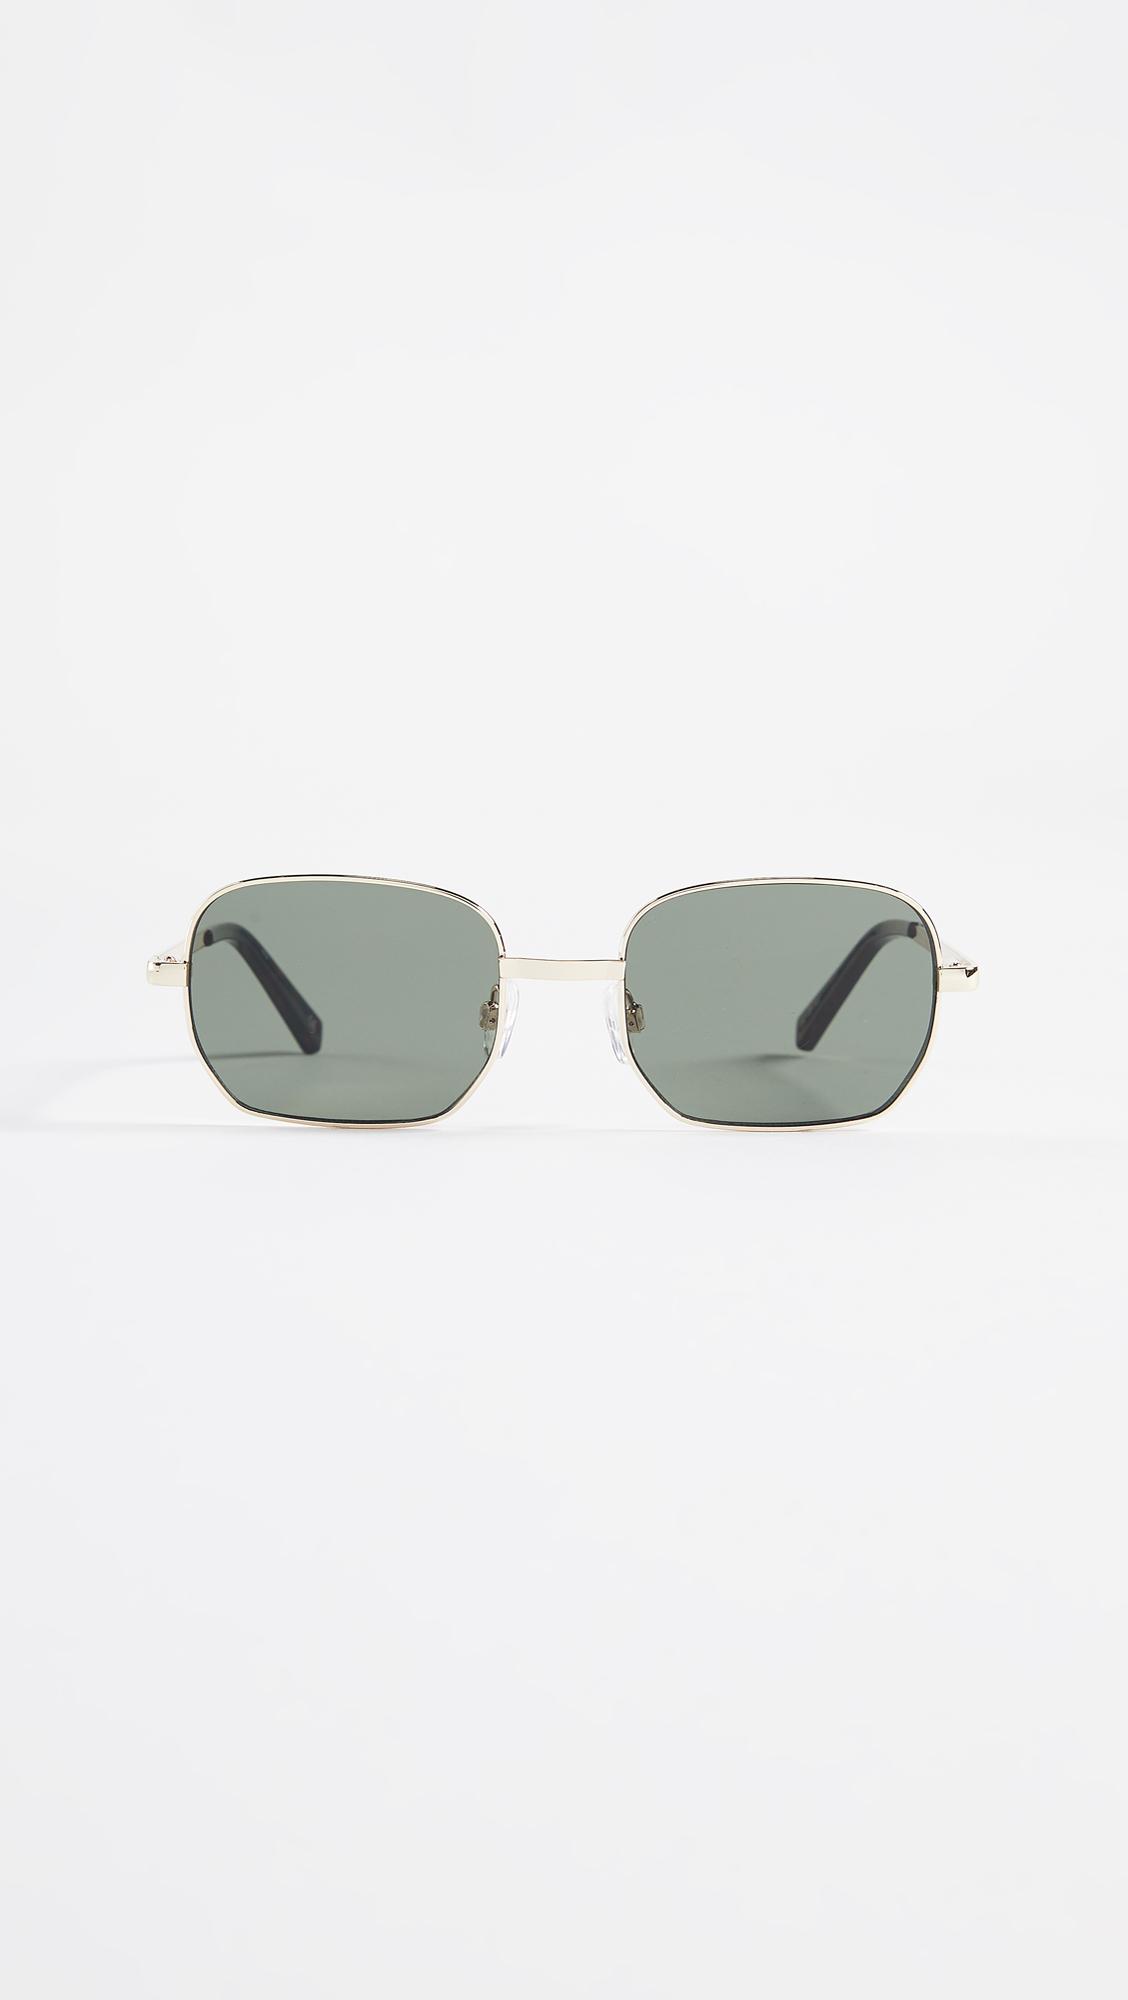 The Flash Sunglasses Black